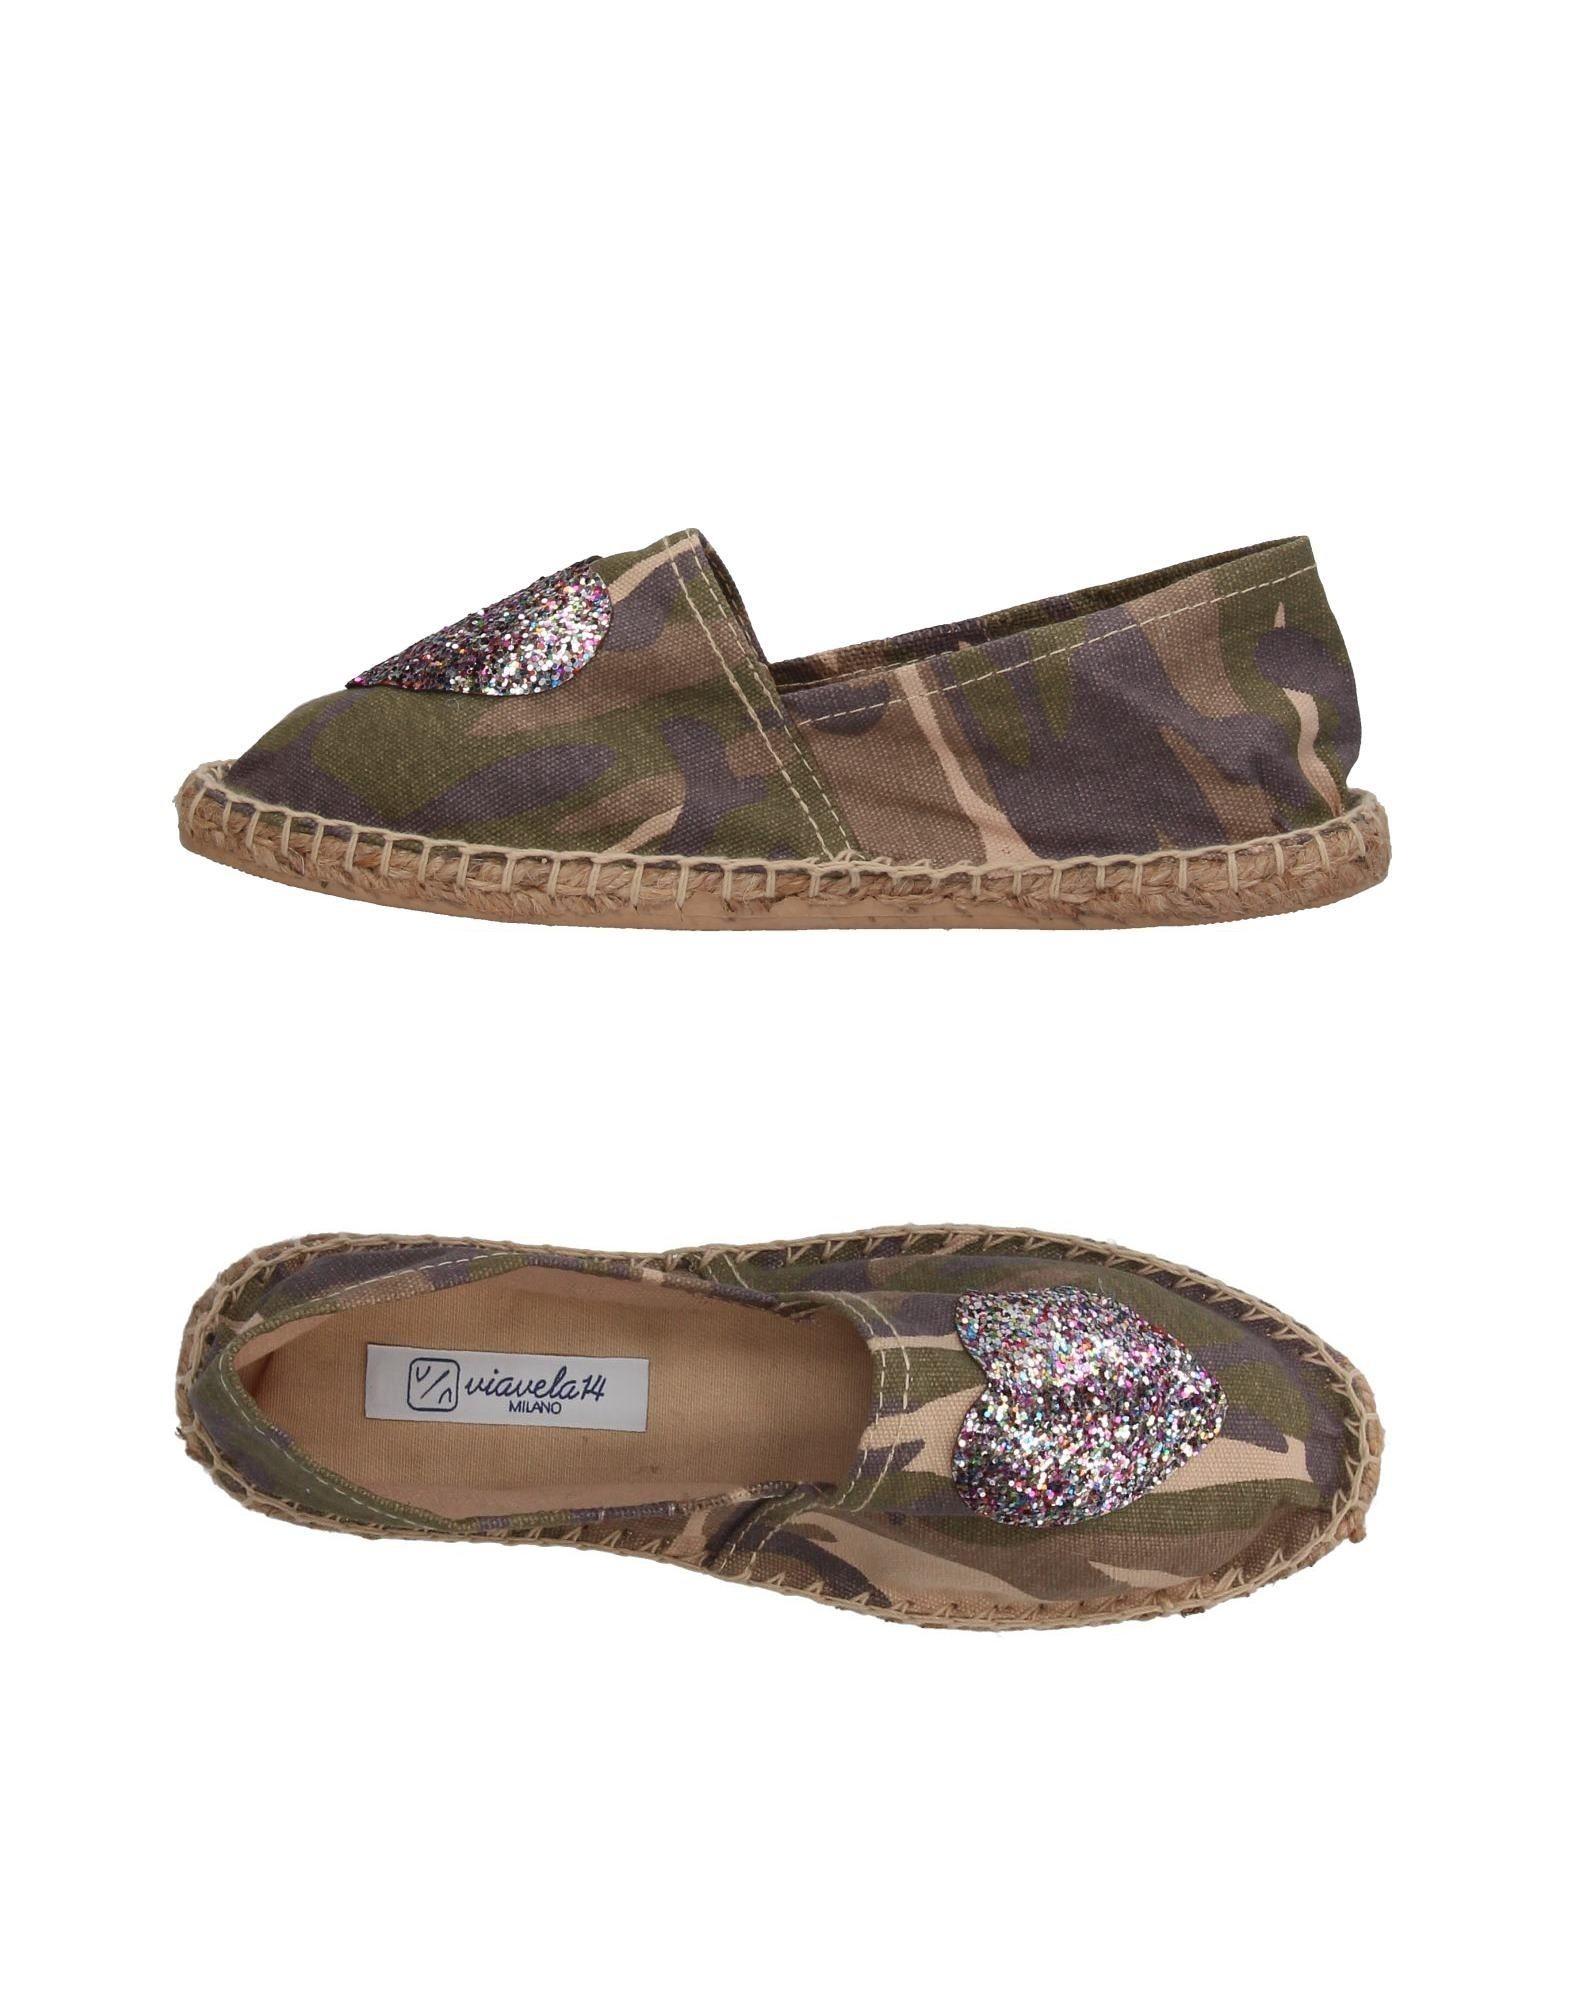 Via Vela 14 Espadrilles Damen  11385822TD Gute Qualität beliebte Schuhe